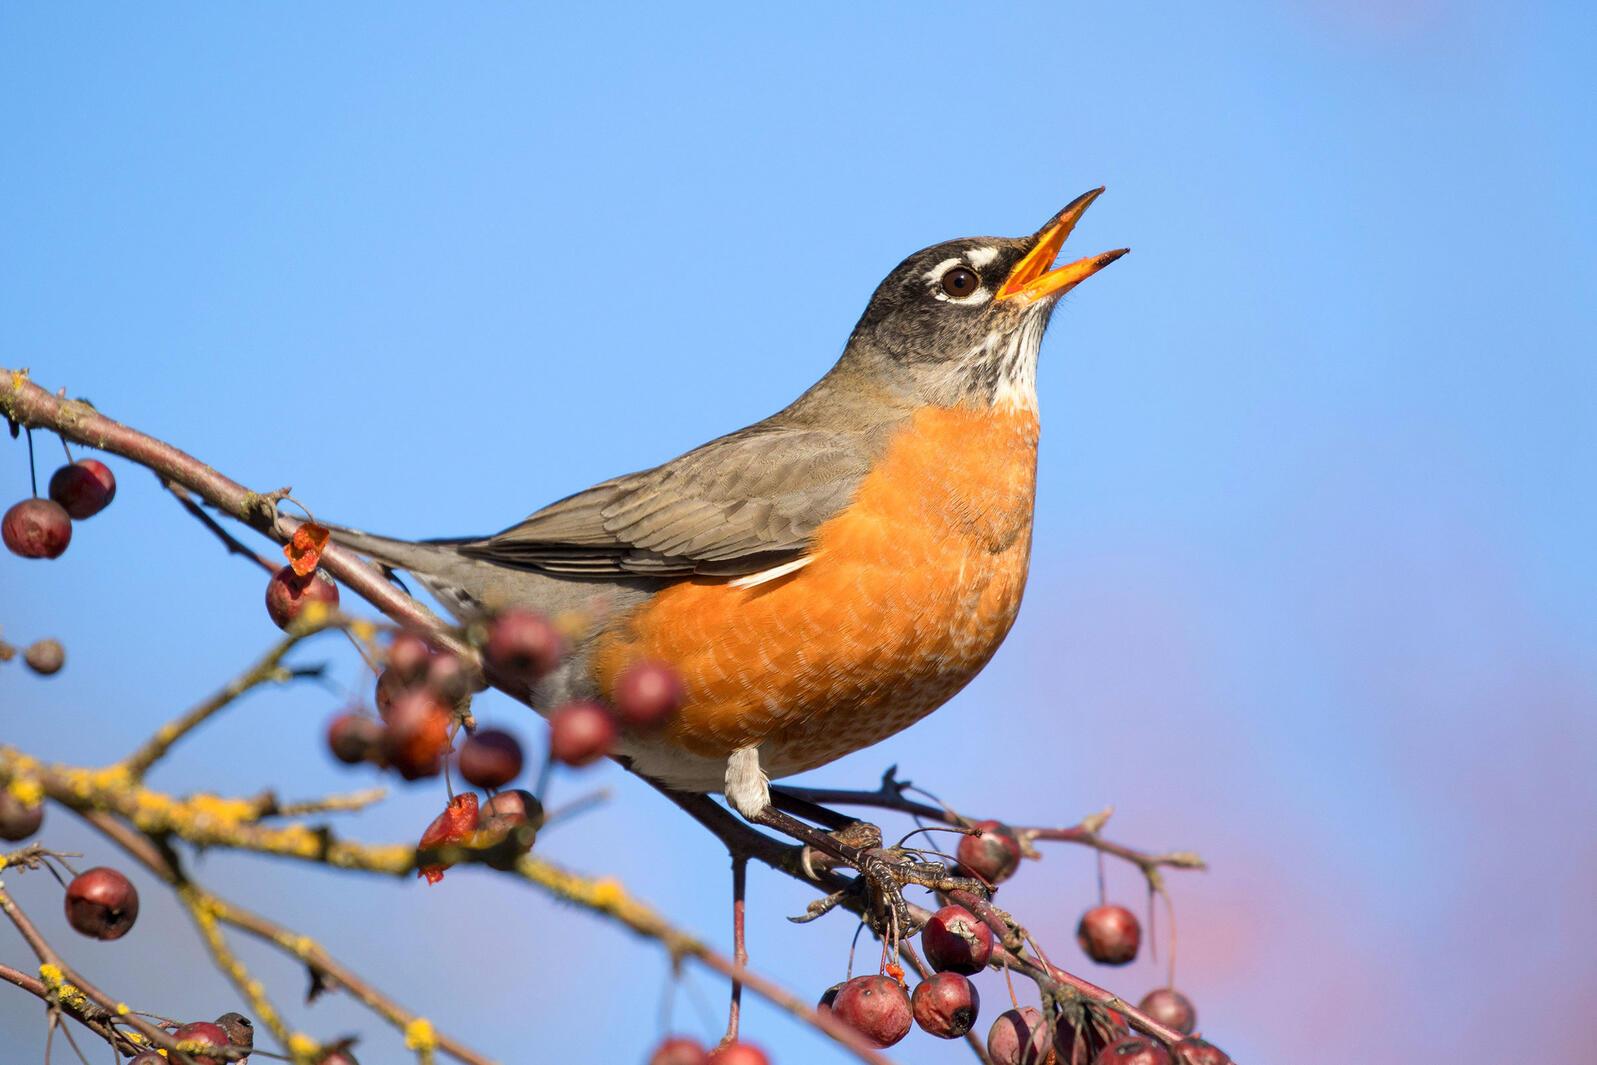 American Robin. George Ostertag/Alamy